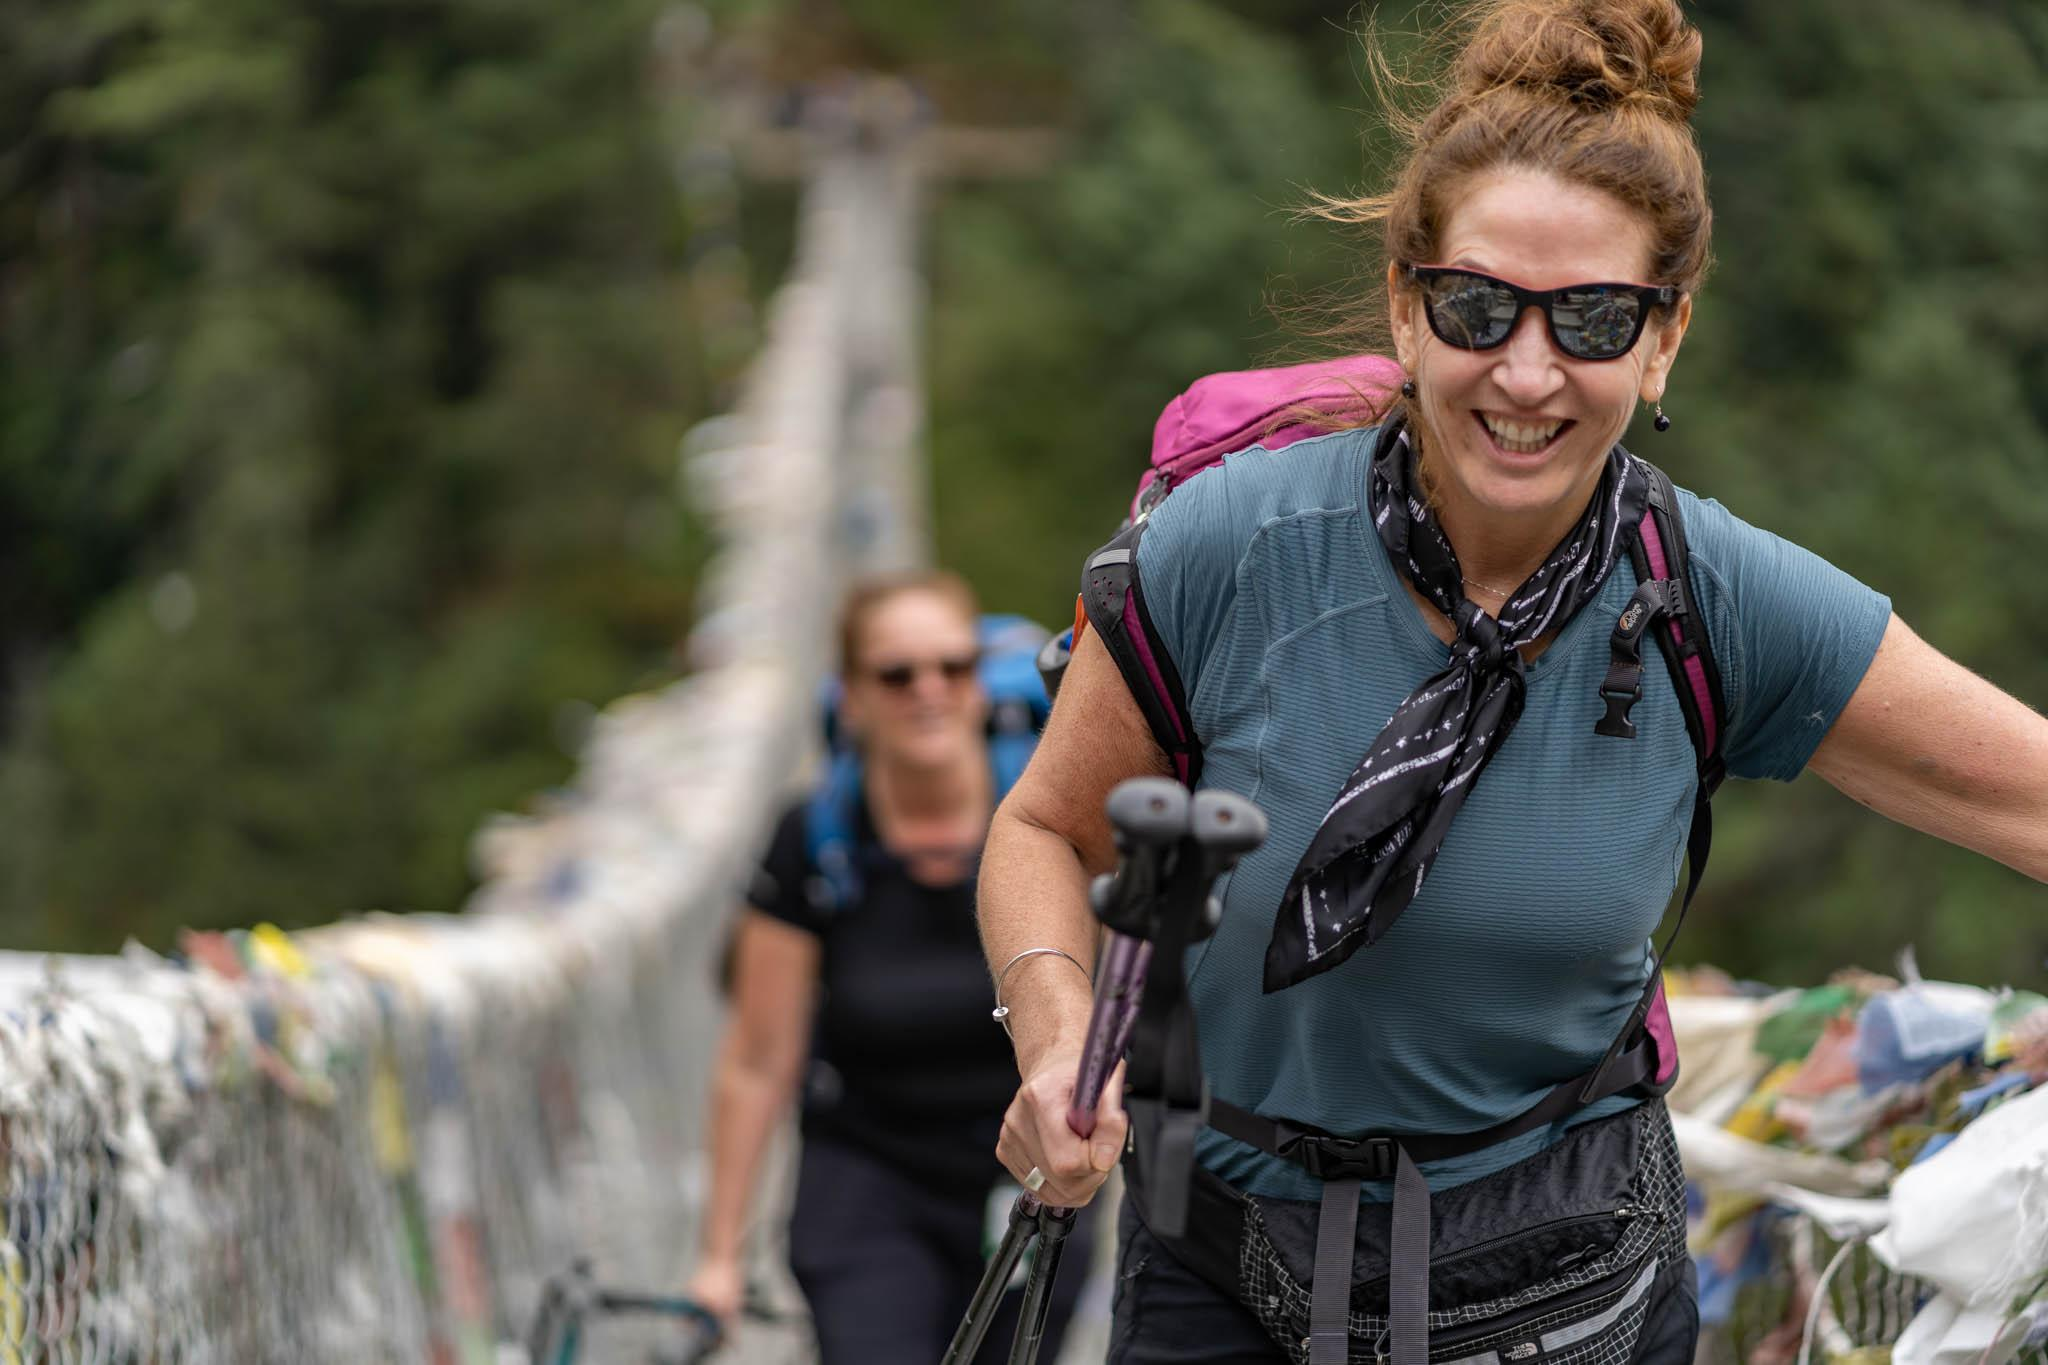 Two women on one of the suspension bridges on the trek